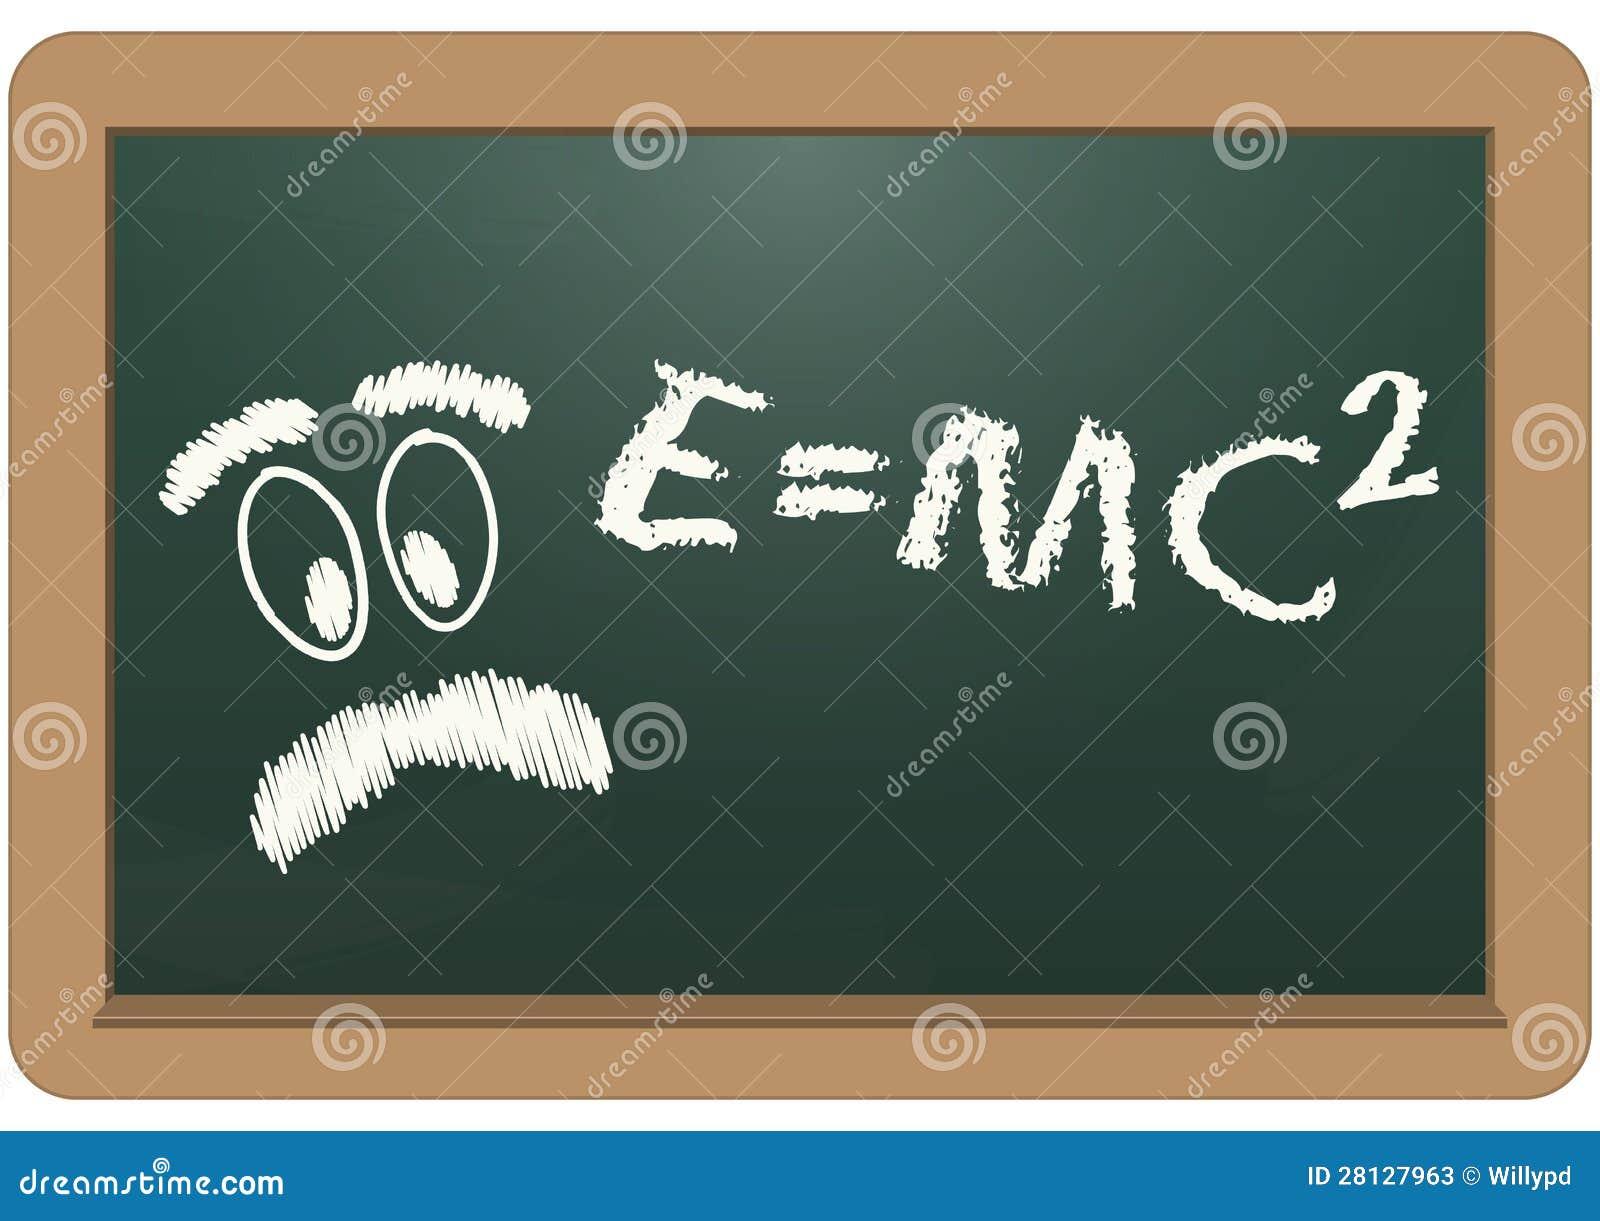 Classroom Design Drawing ~ E mc chalkboard stock photos image